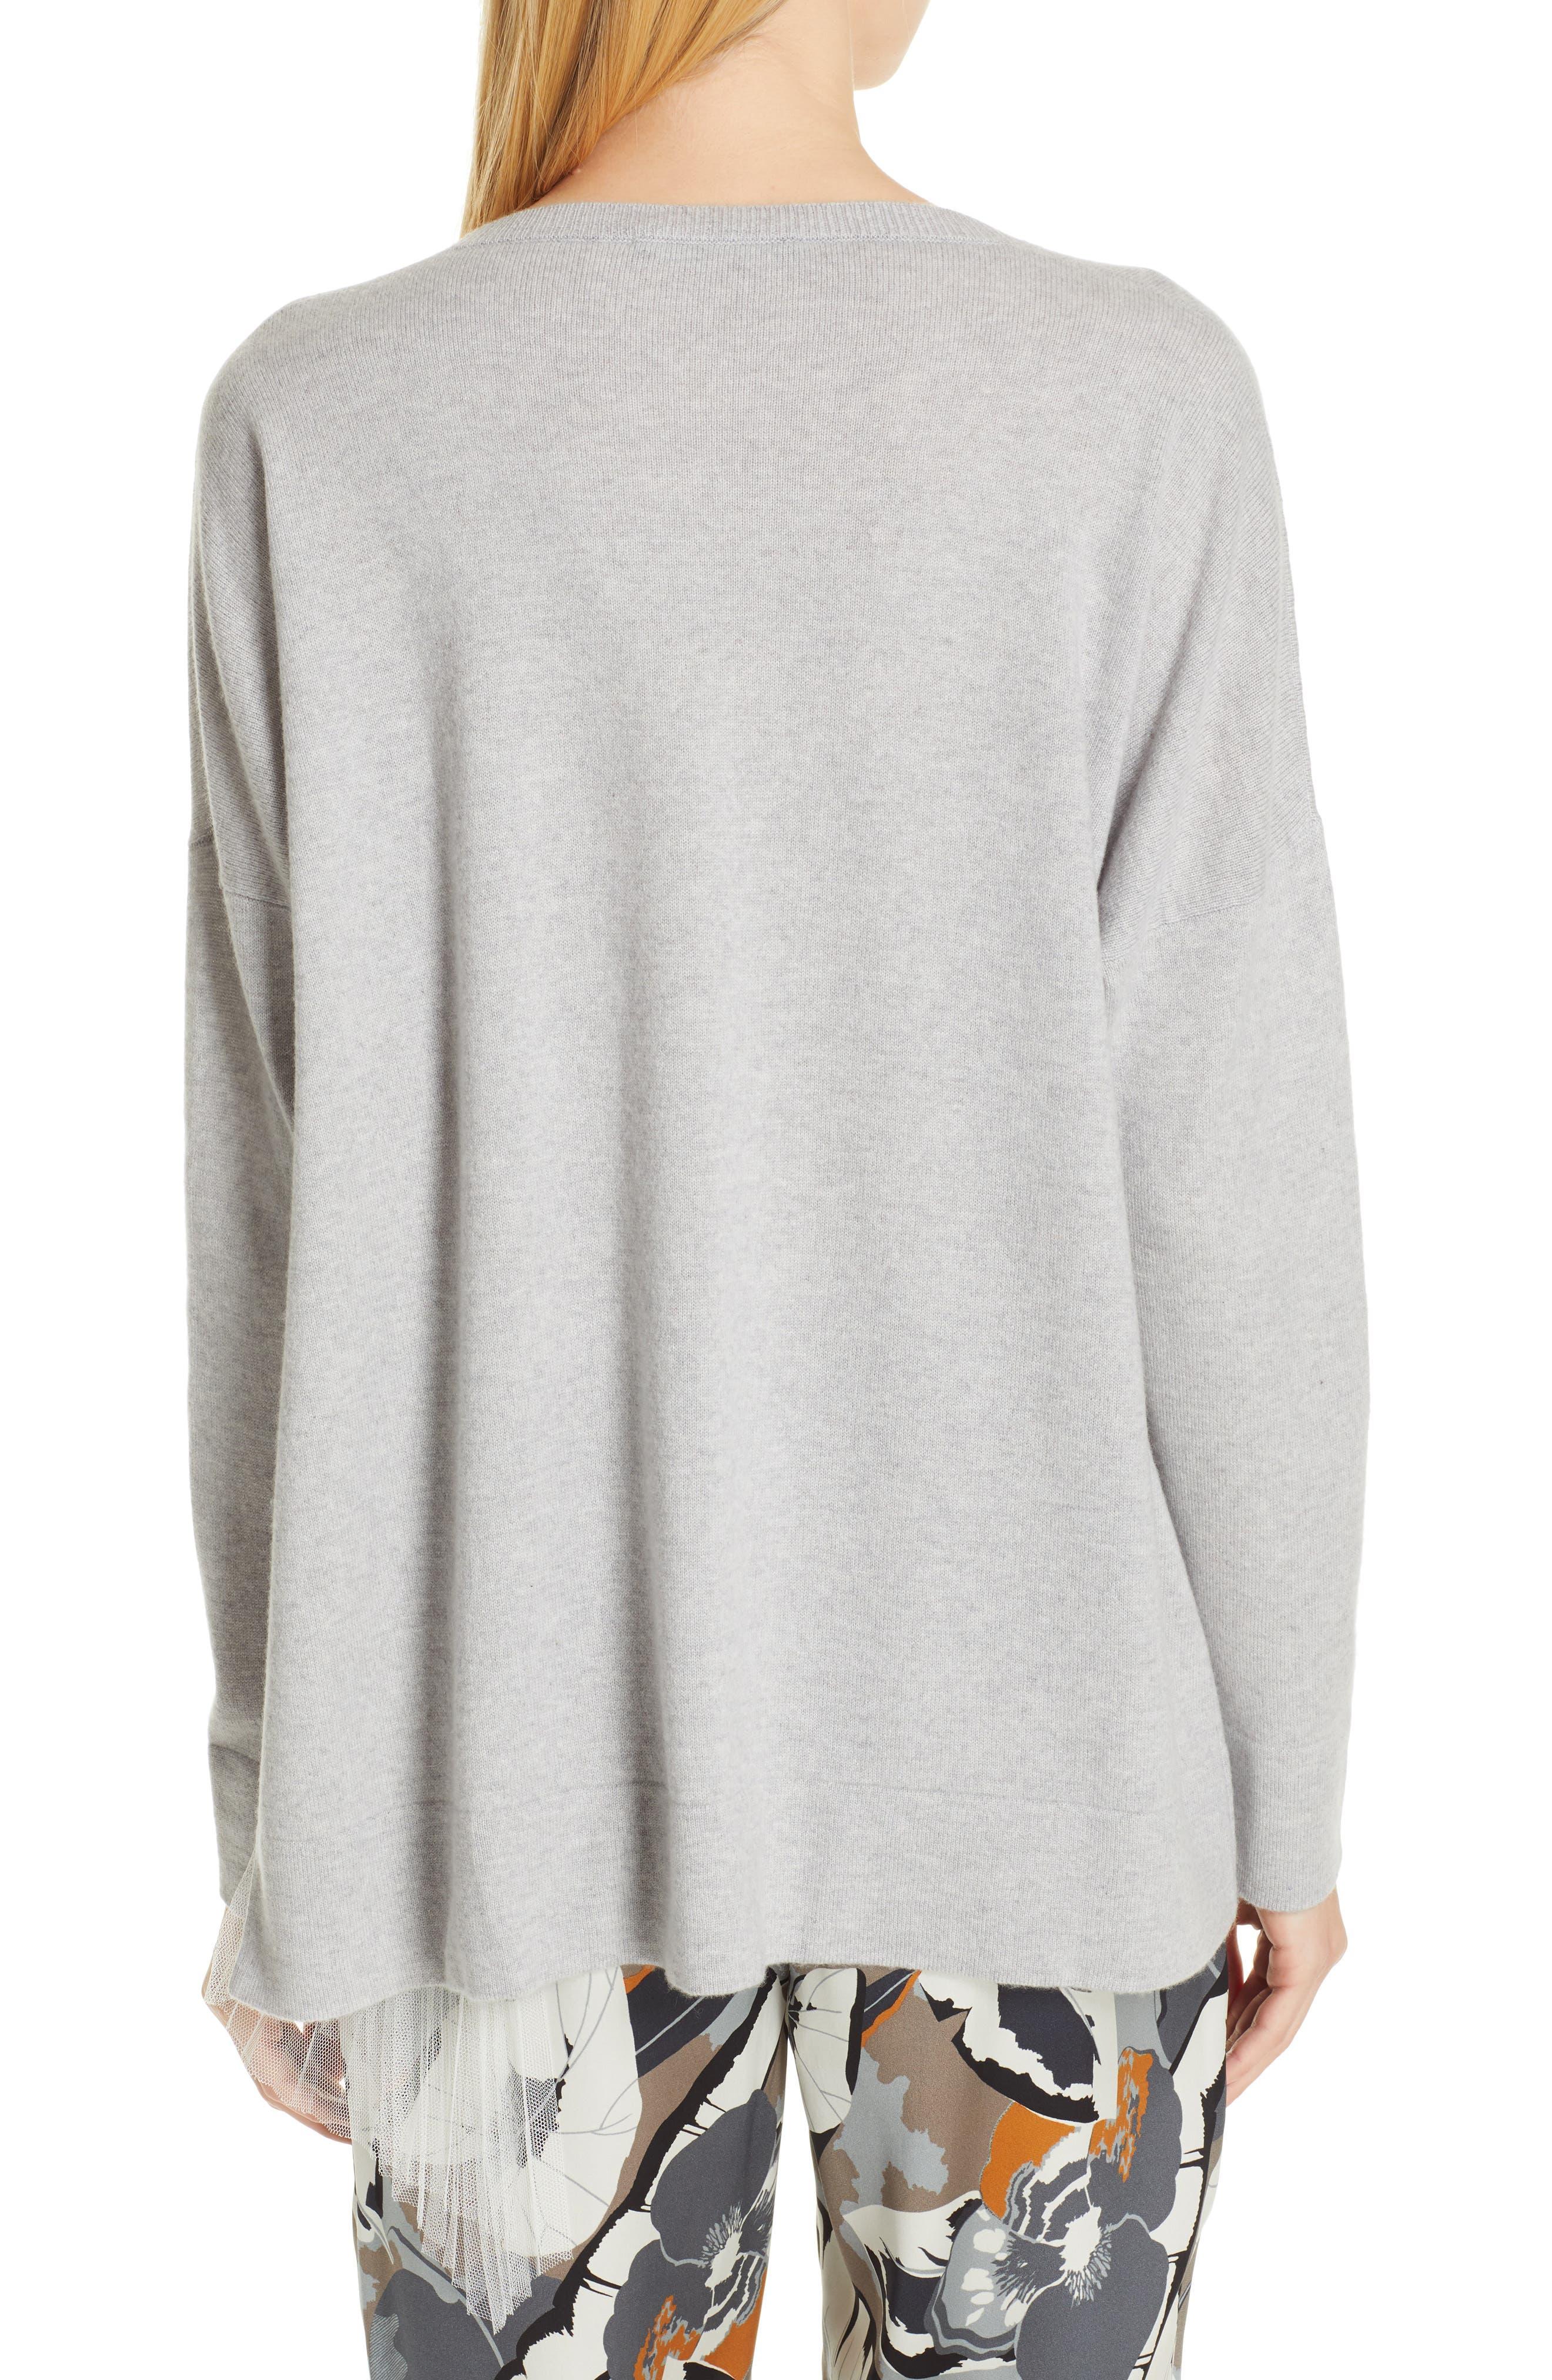 FABIANA FILIPPI,                             Tulle Inset Cashmere Sweater,                             Alternate thumbnail 2, color,                             GREY